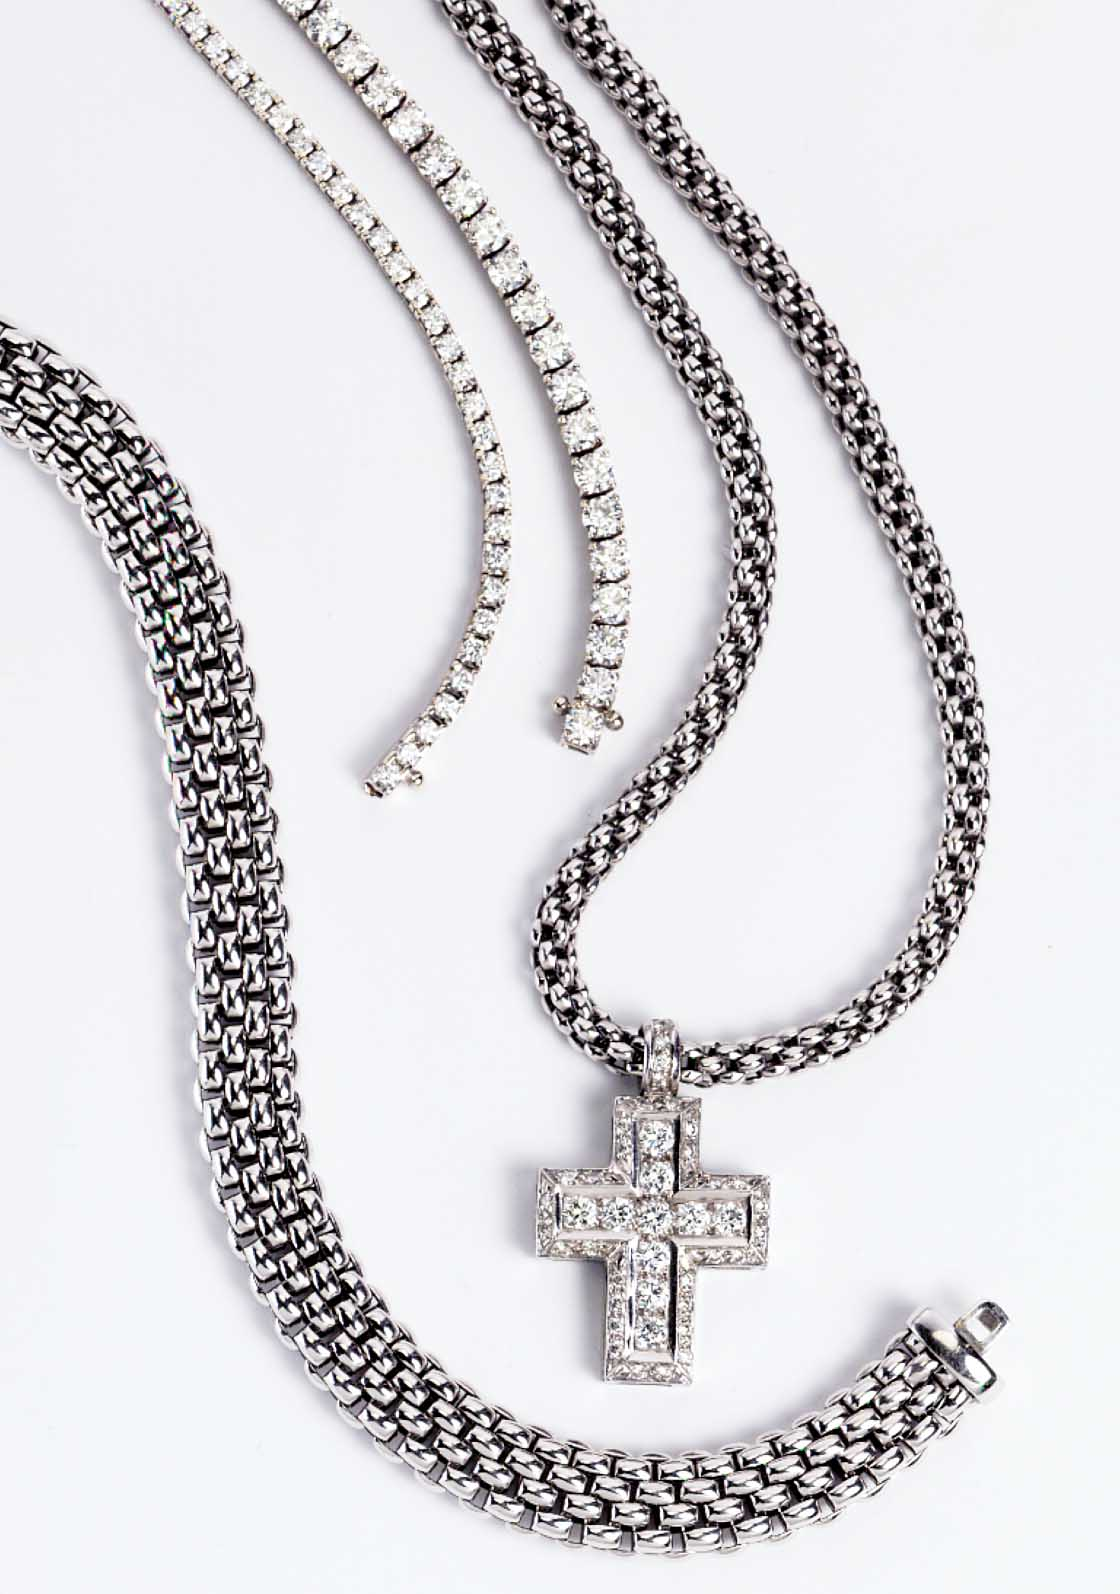 criss cross jewelry.jpg